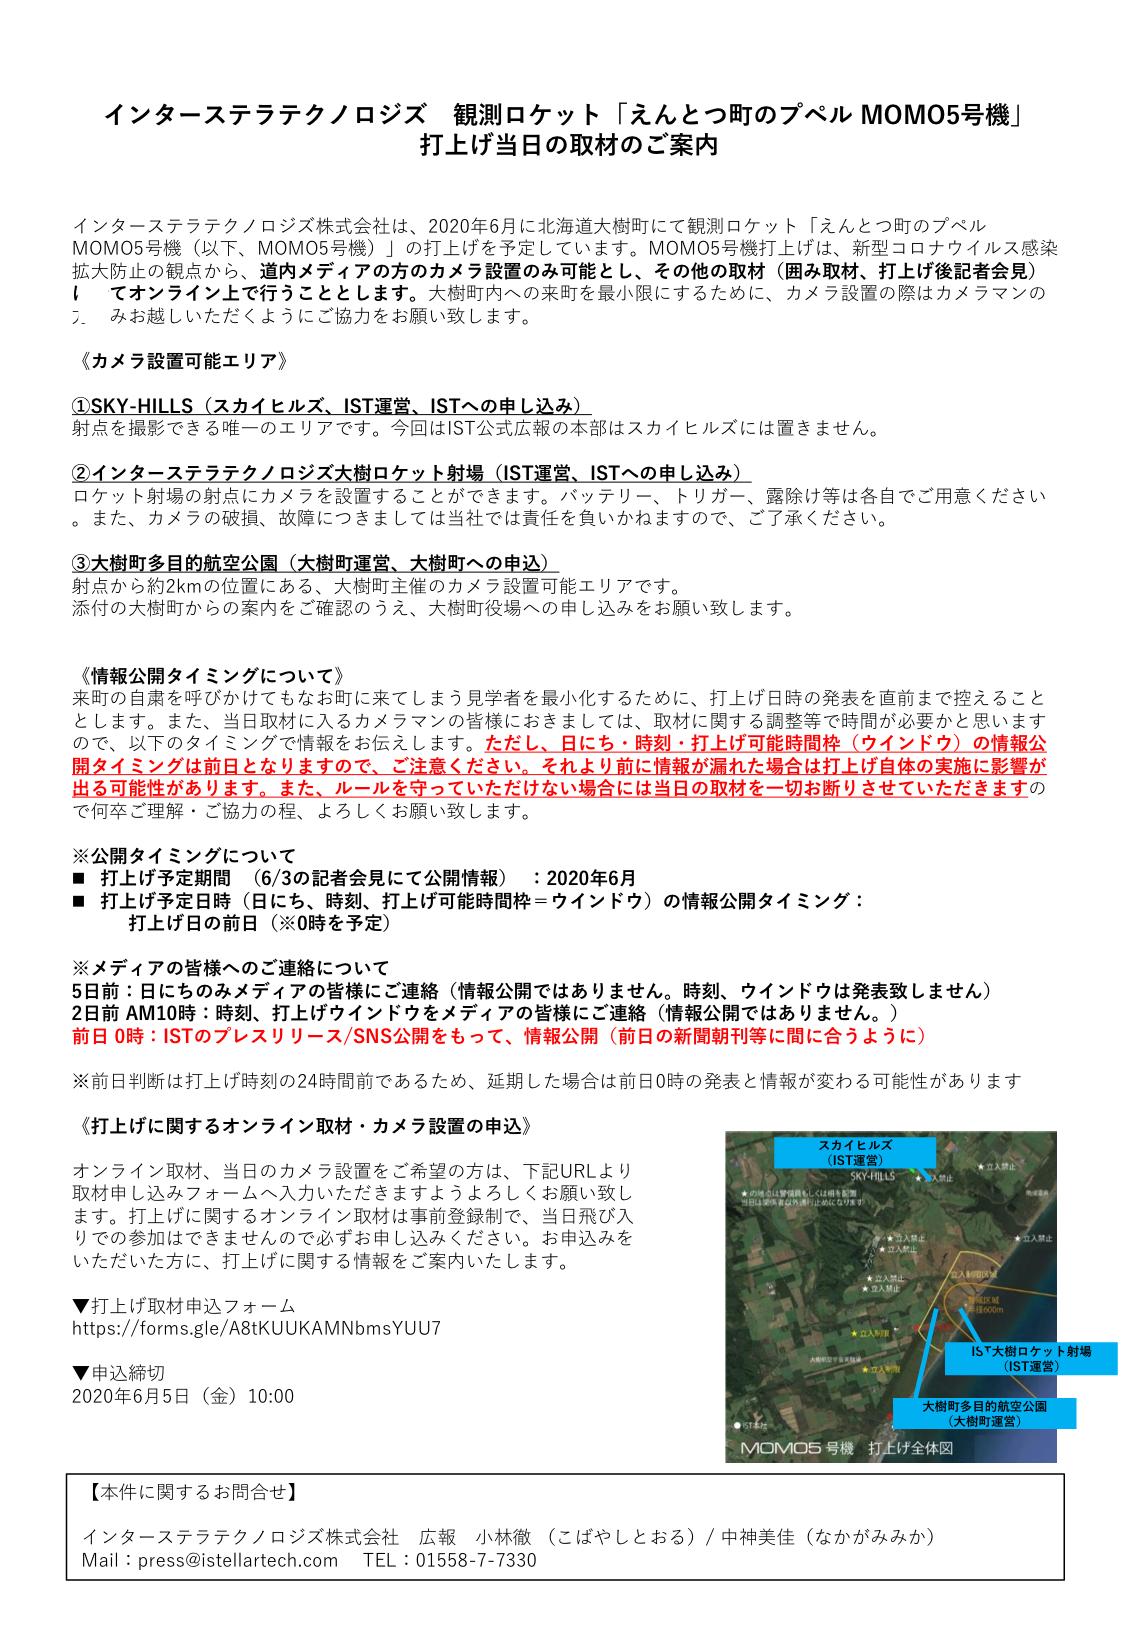 f:id:Imamura:20200603233356p:plain